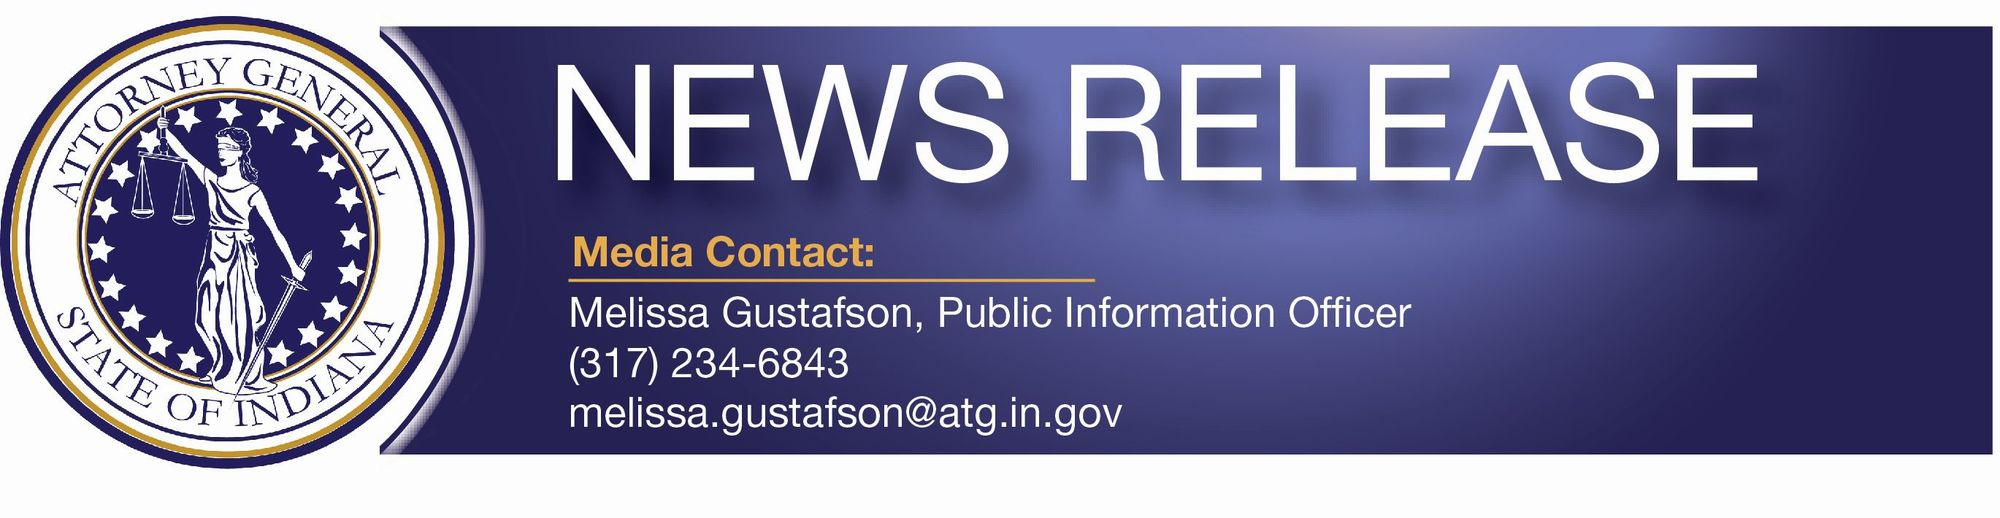 News Release - MG